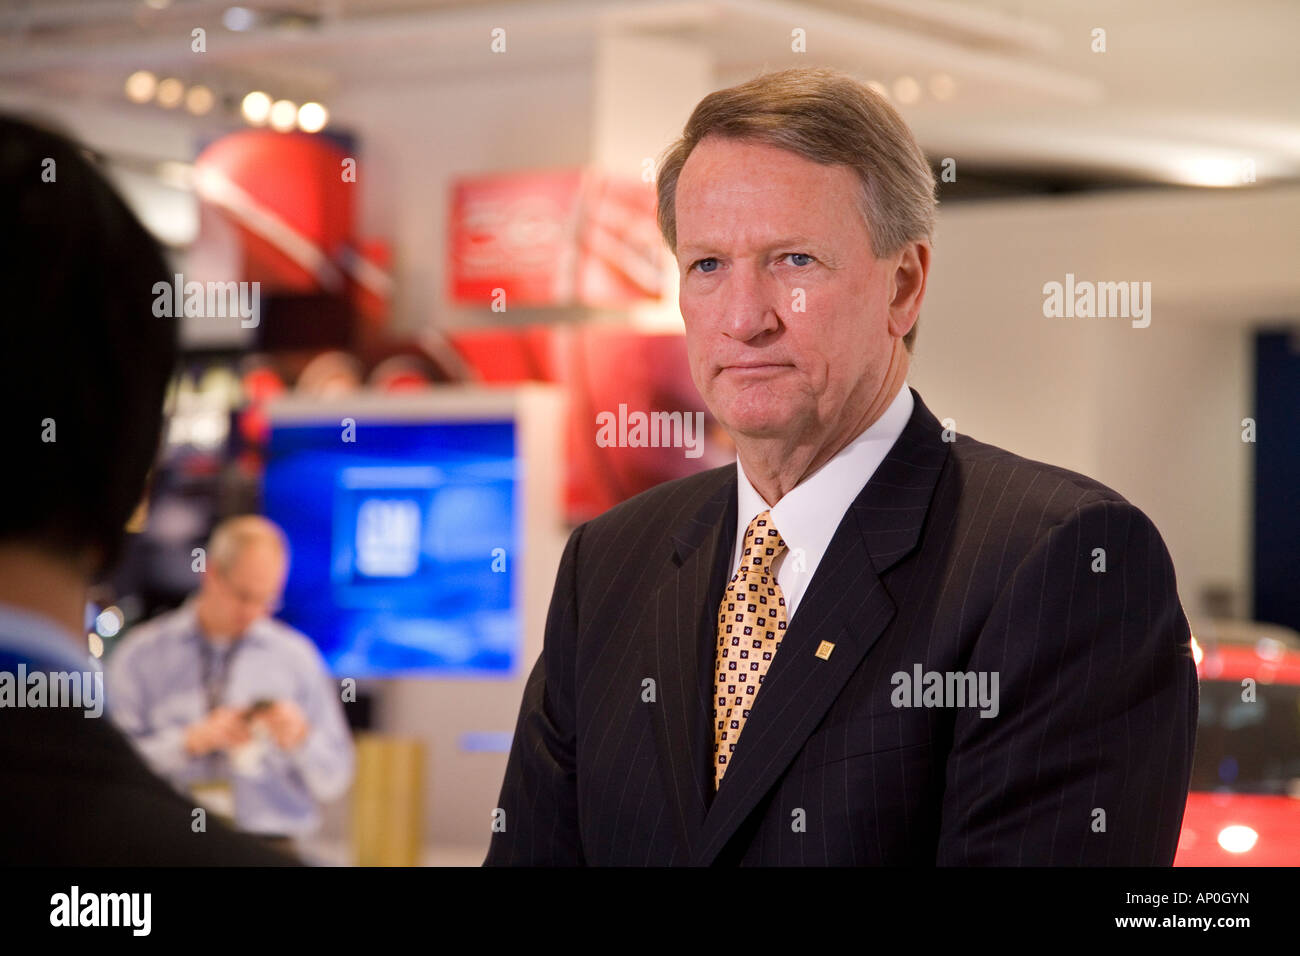 Detroit Michigan General Motors CEO Rick Wagoner at the North American International Auto Show - Stock Image